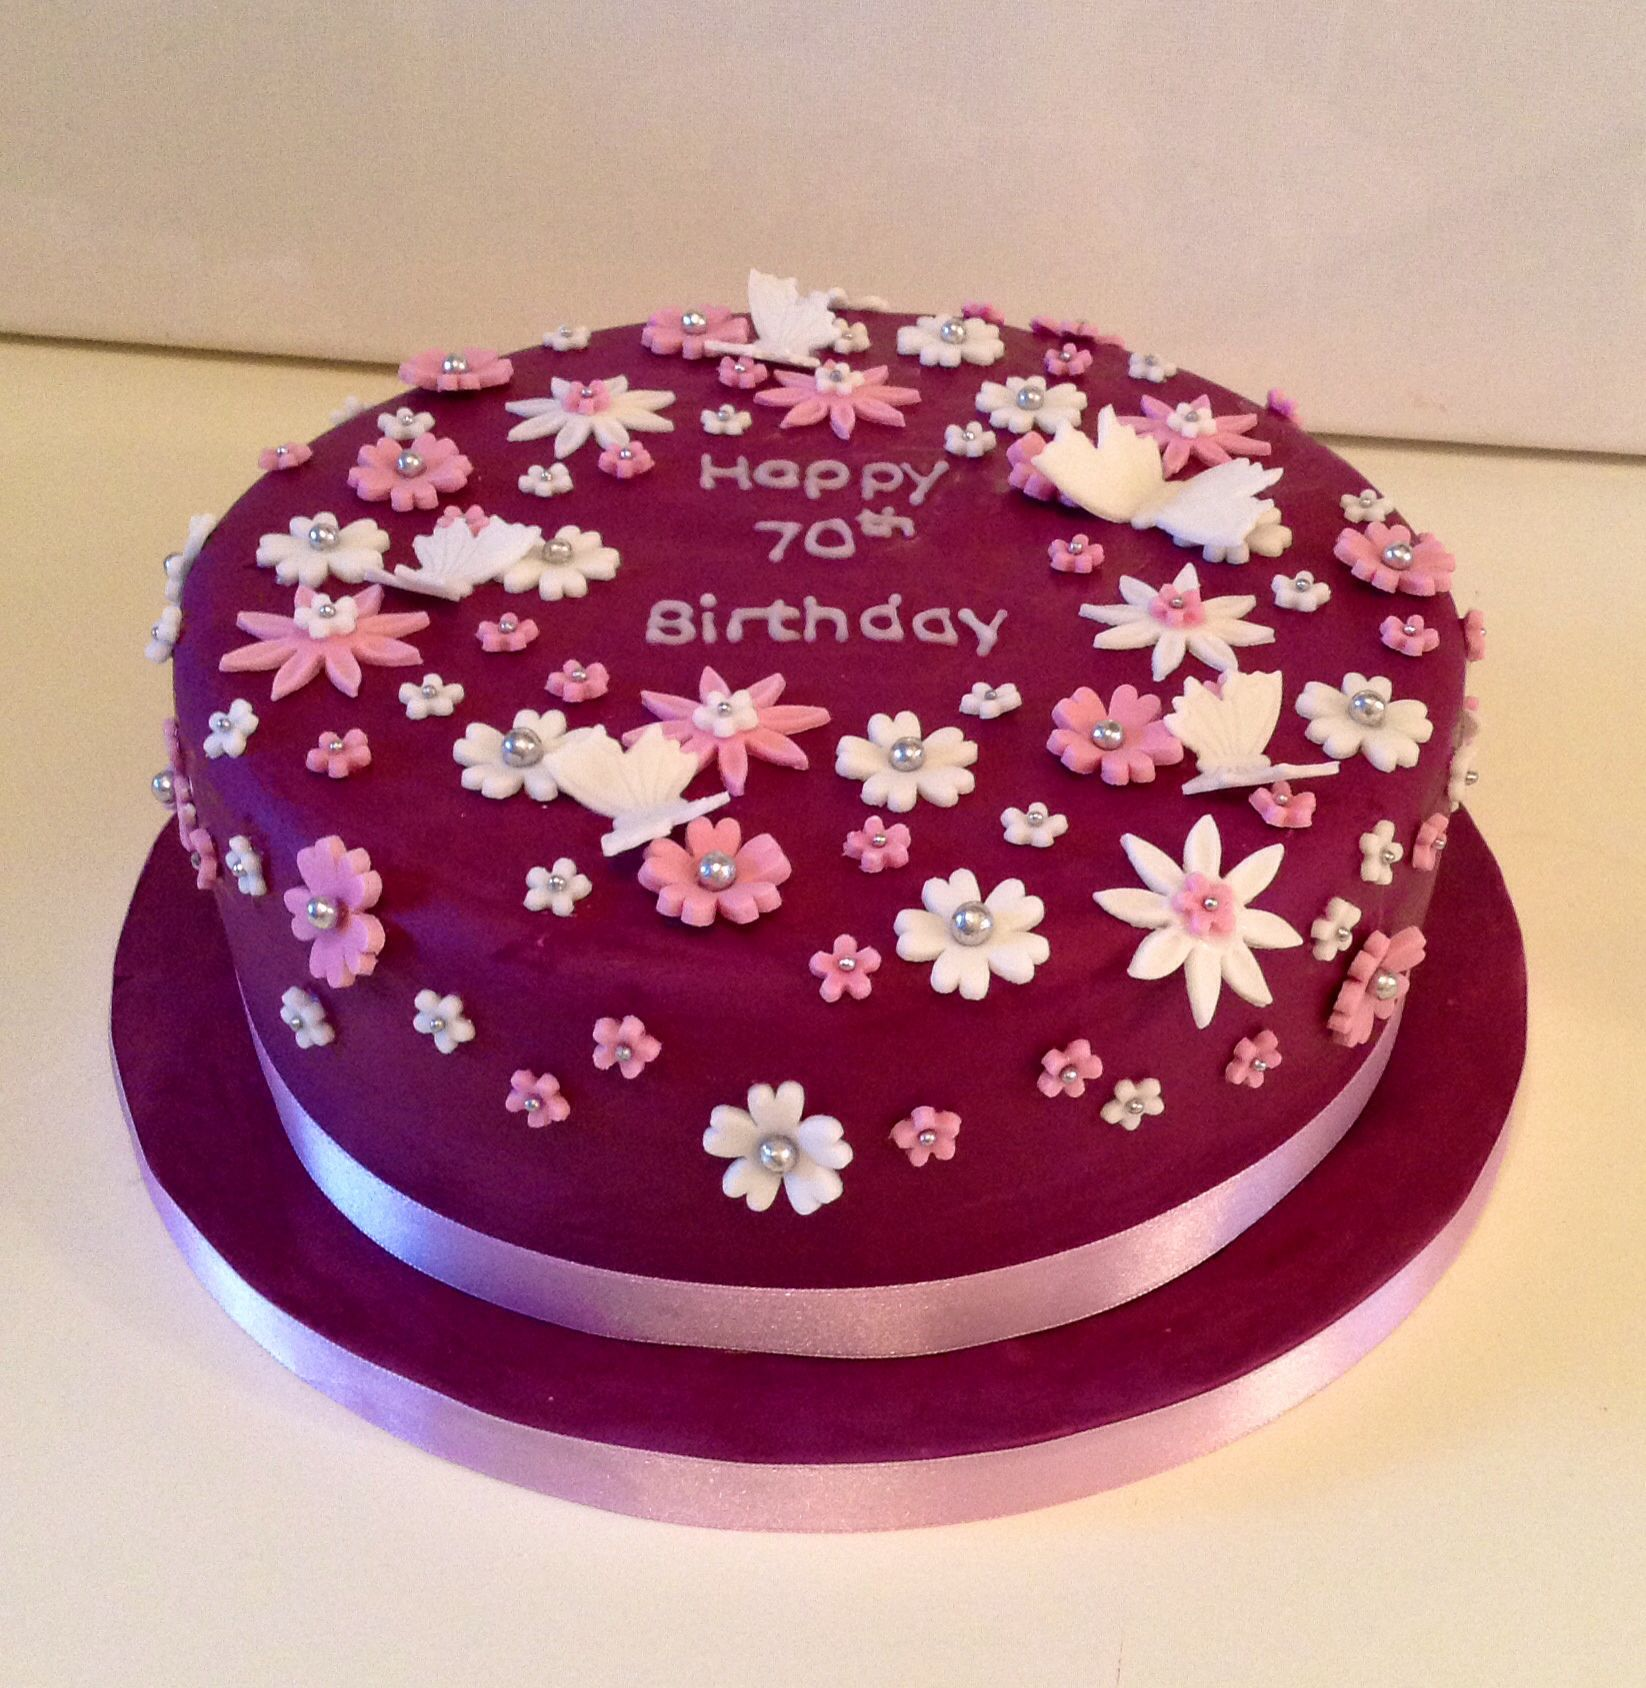 70Th Birthday Cakes, 70Th Bday, Birthdays, Adult Cakes